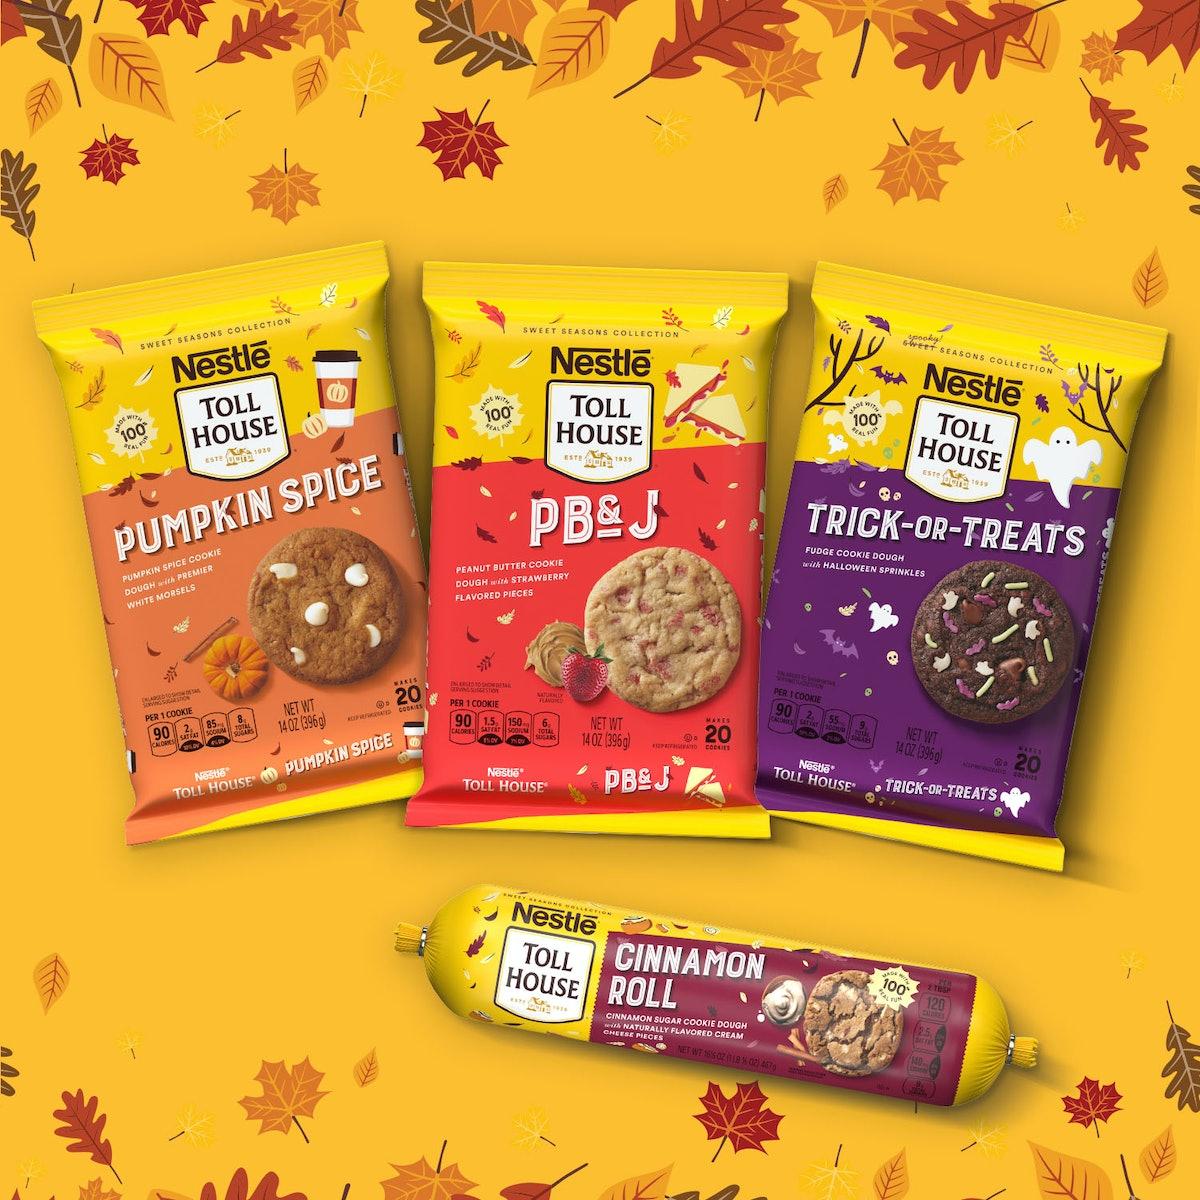 Nestlé Toll House's fall 2021 cookie dough flavors include seasonal bites like Pumpkin Spice and Cin...